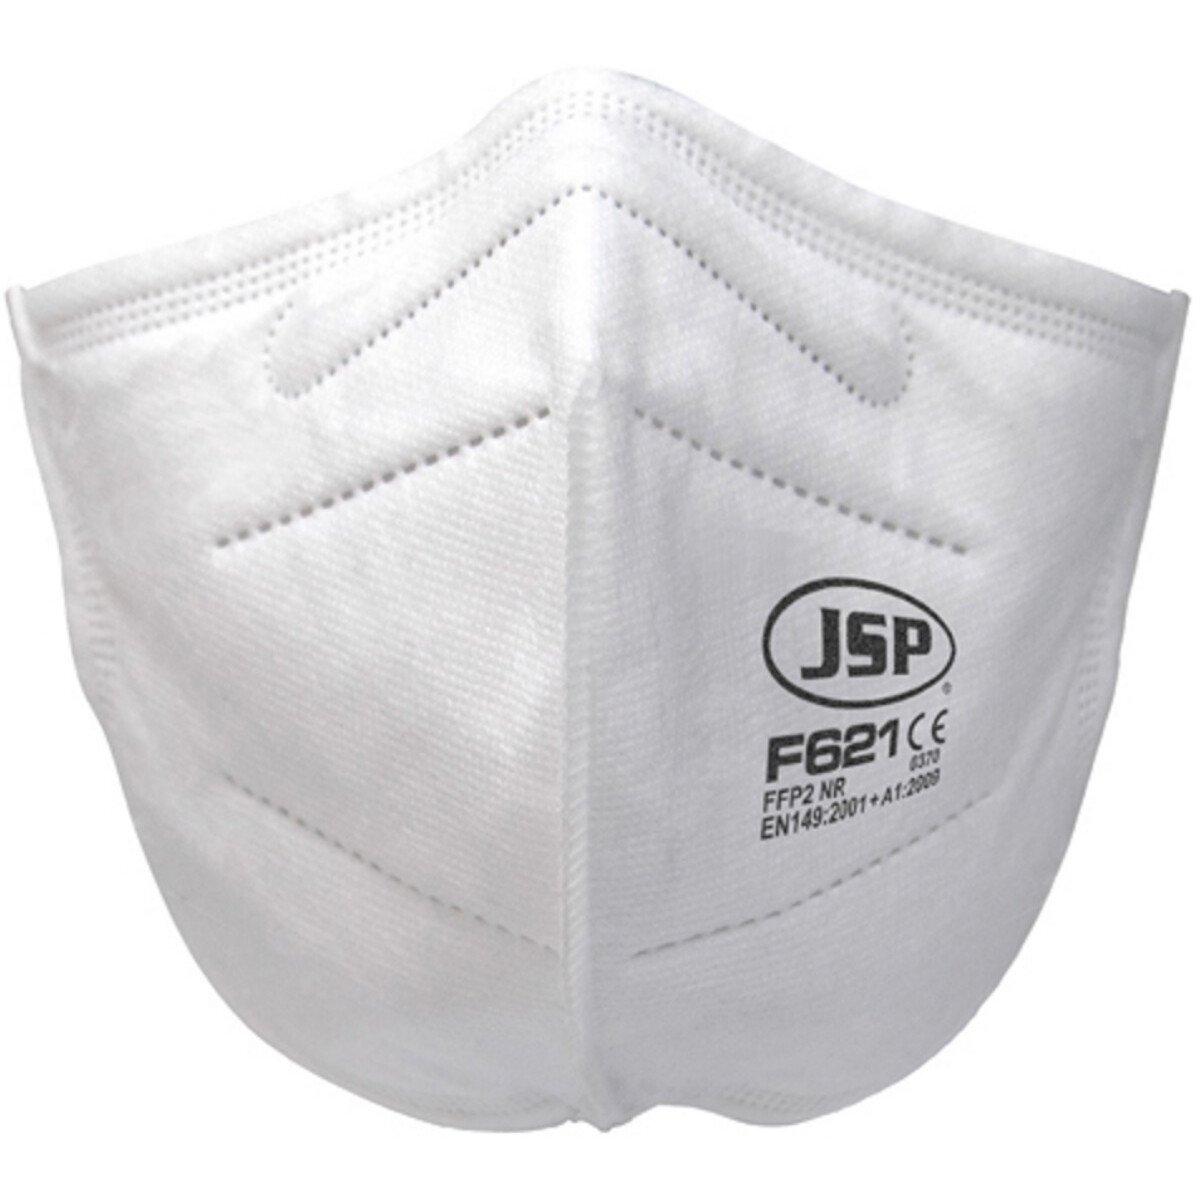 JSP BGV120-000-Q00 Disposable Vertical Fold Flat Mask FFP2 (F621) (Single Mask)